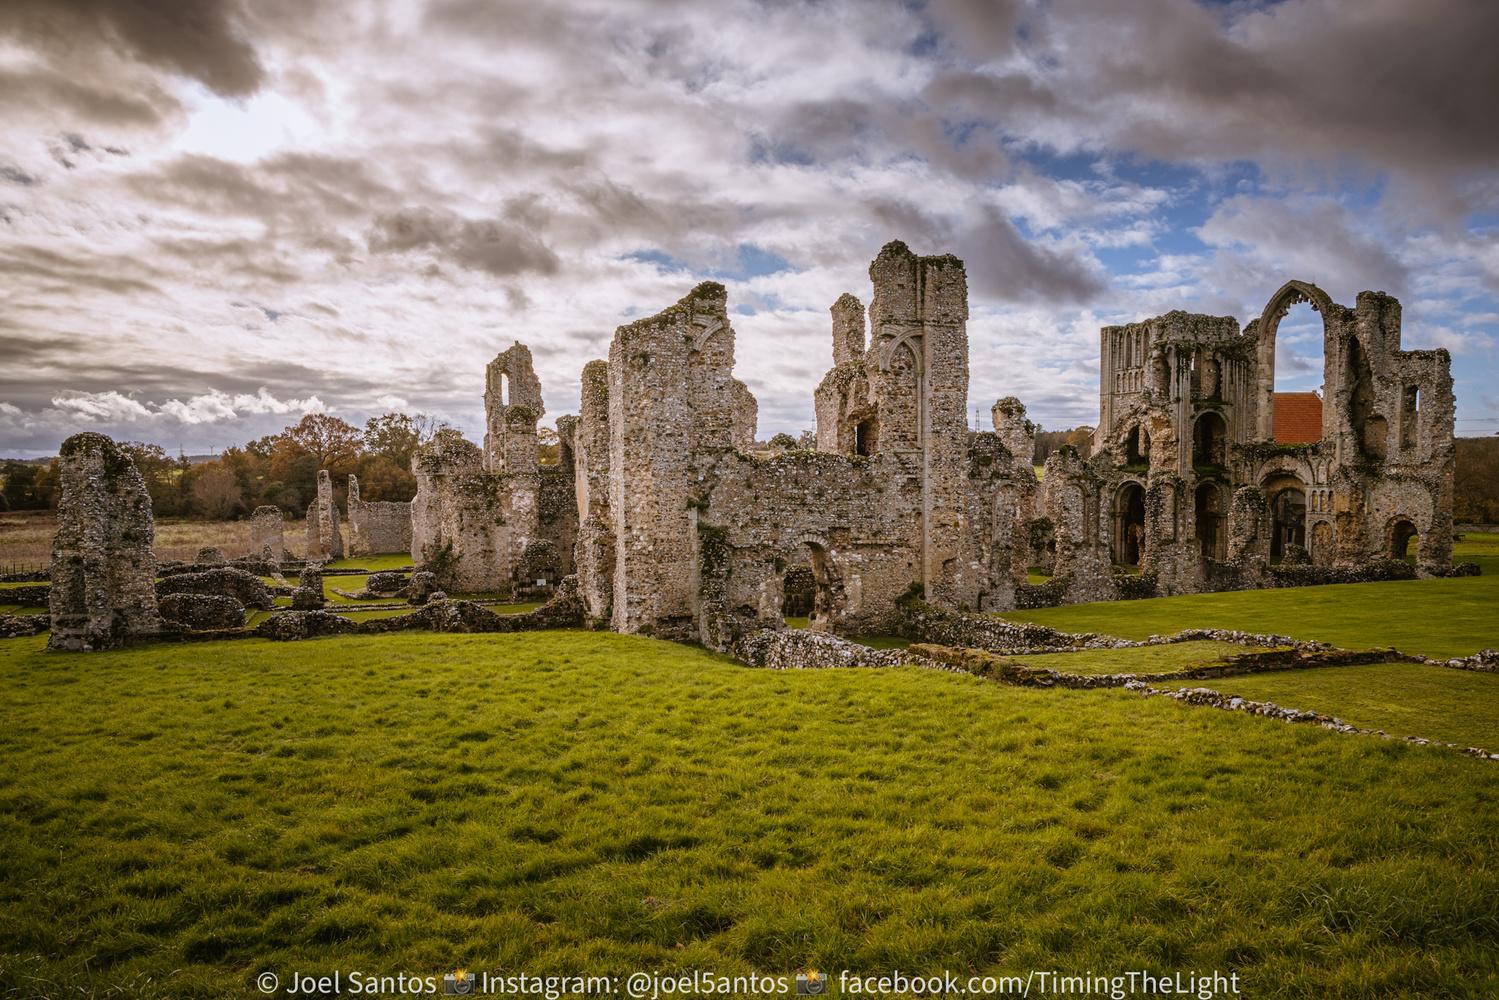 Castle Acre Priory by Joel Santos